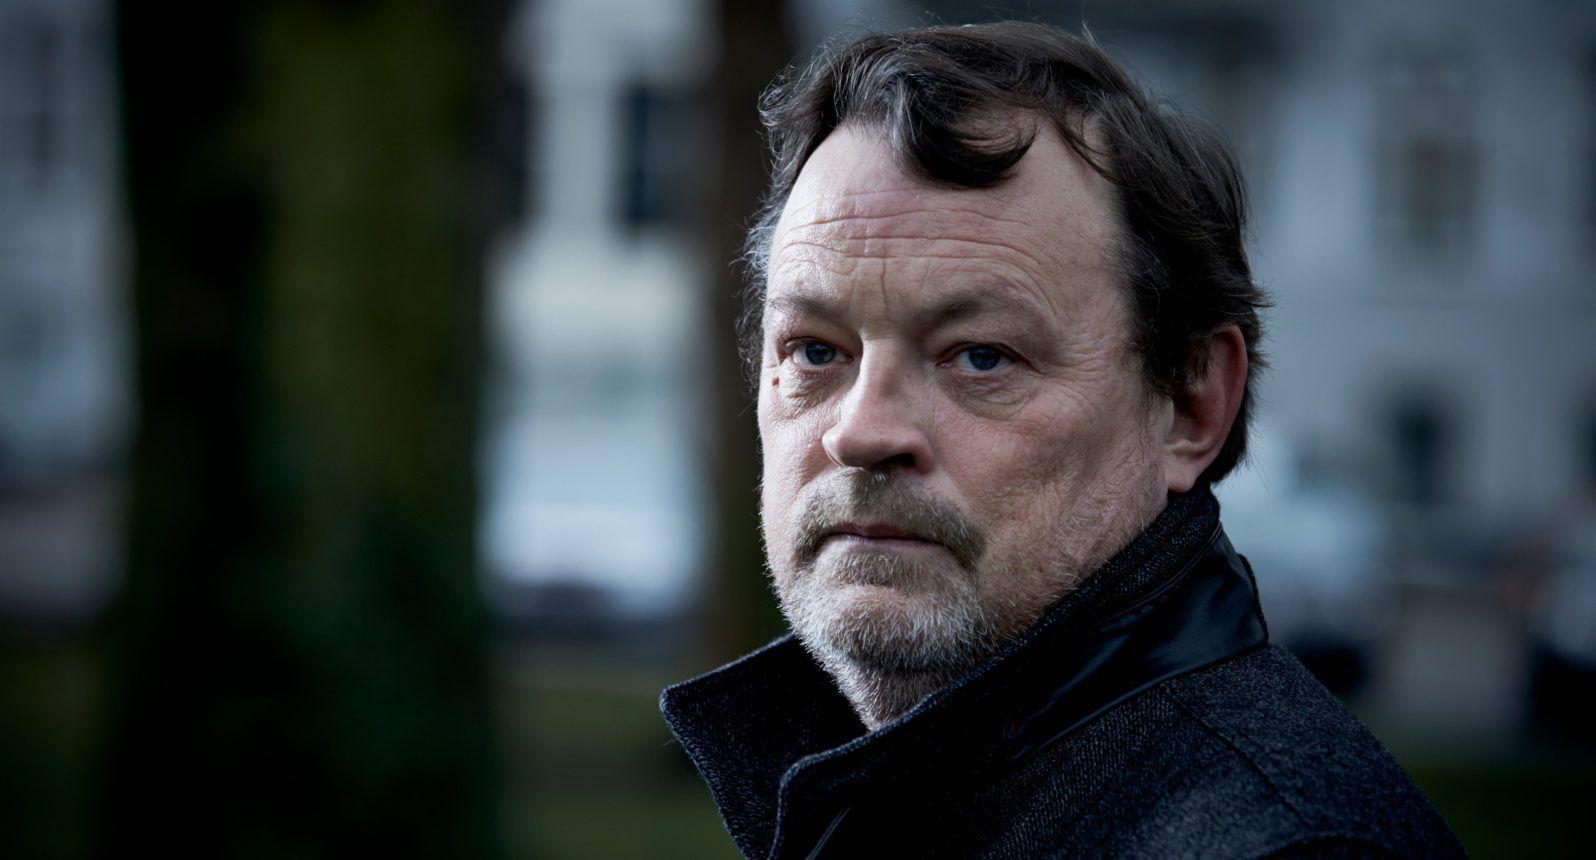 Komponisten Bent Sørensen